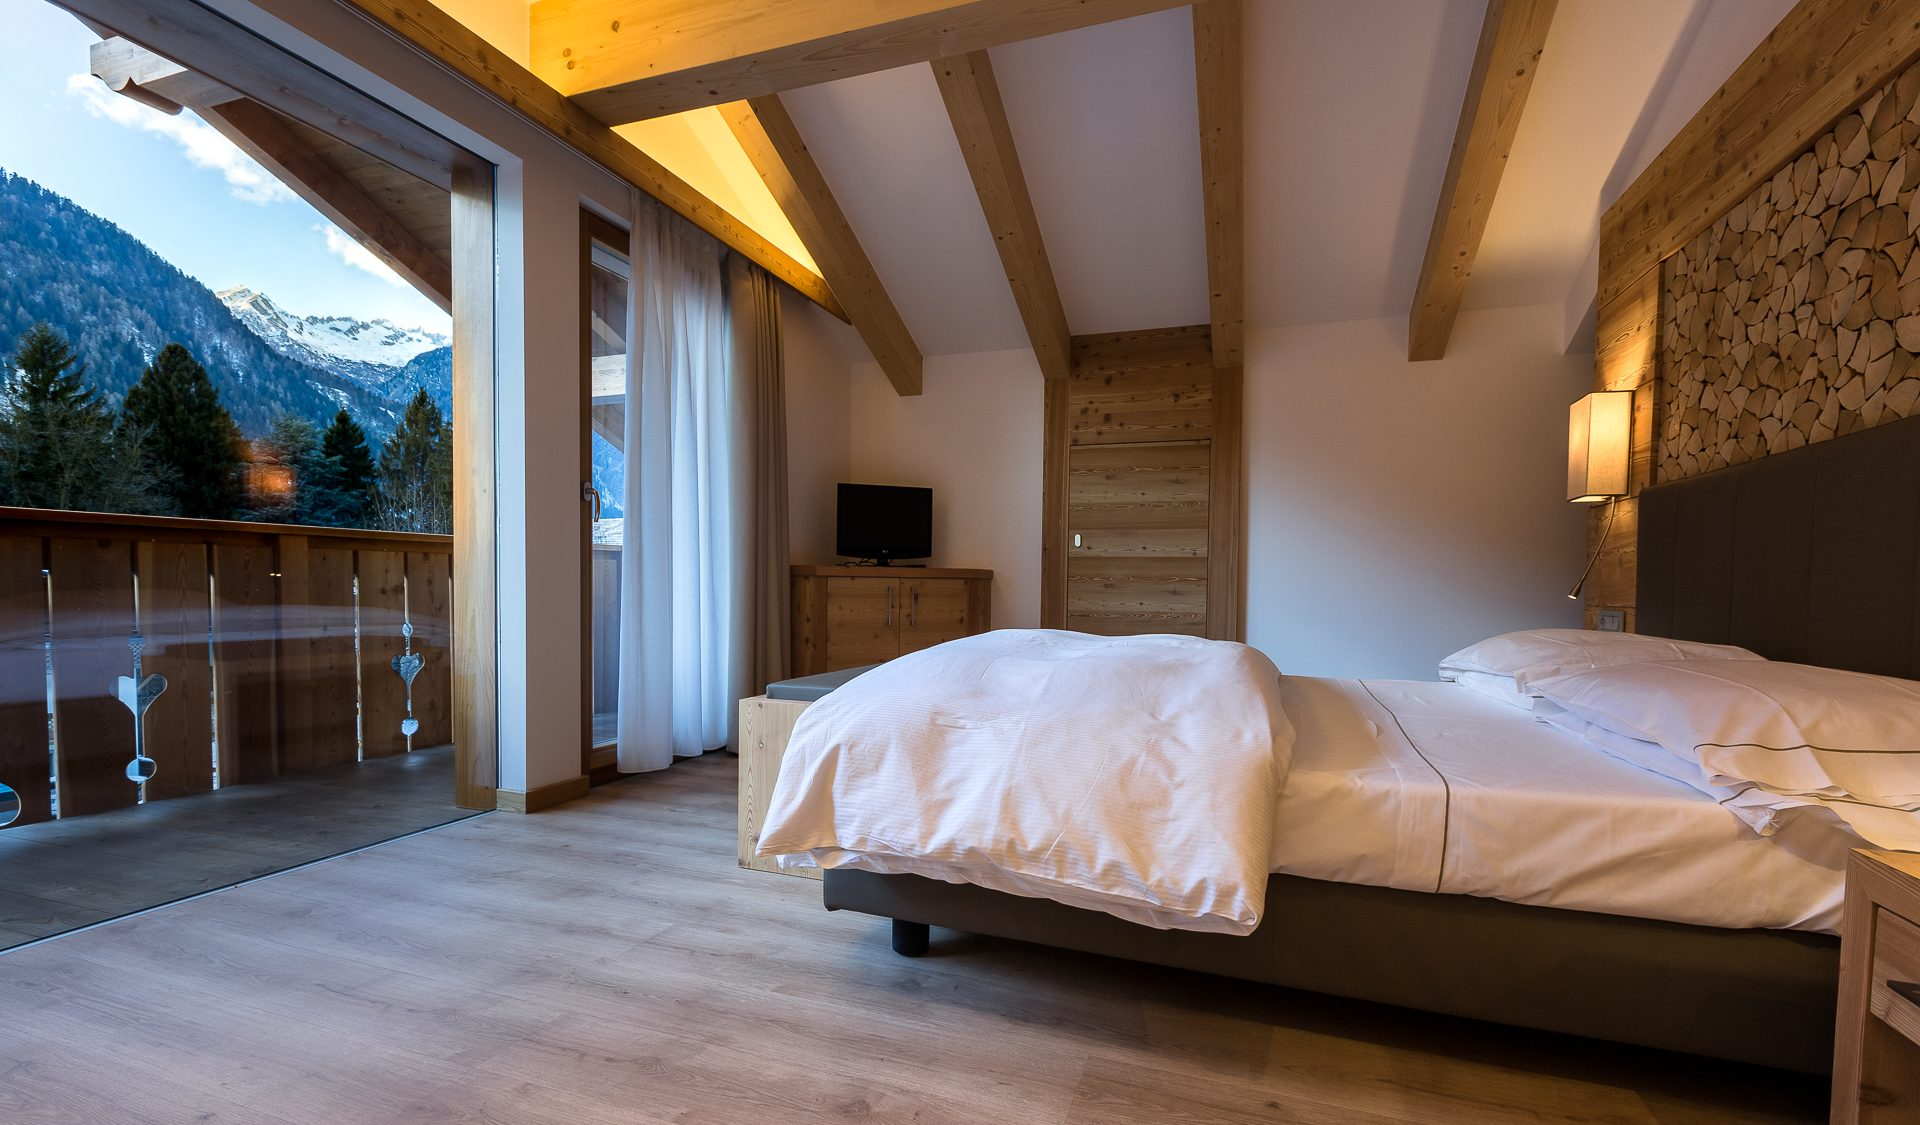 Panoramasuite Hotel Europeo Pinzolo